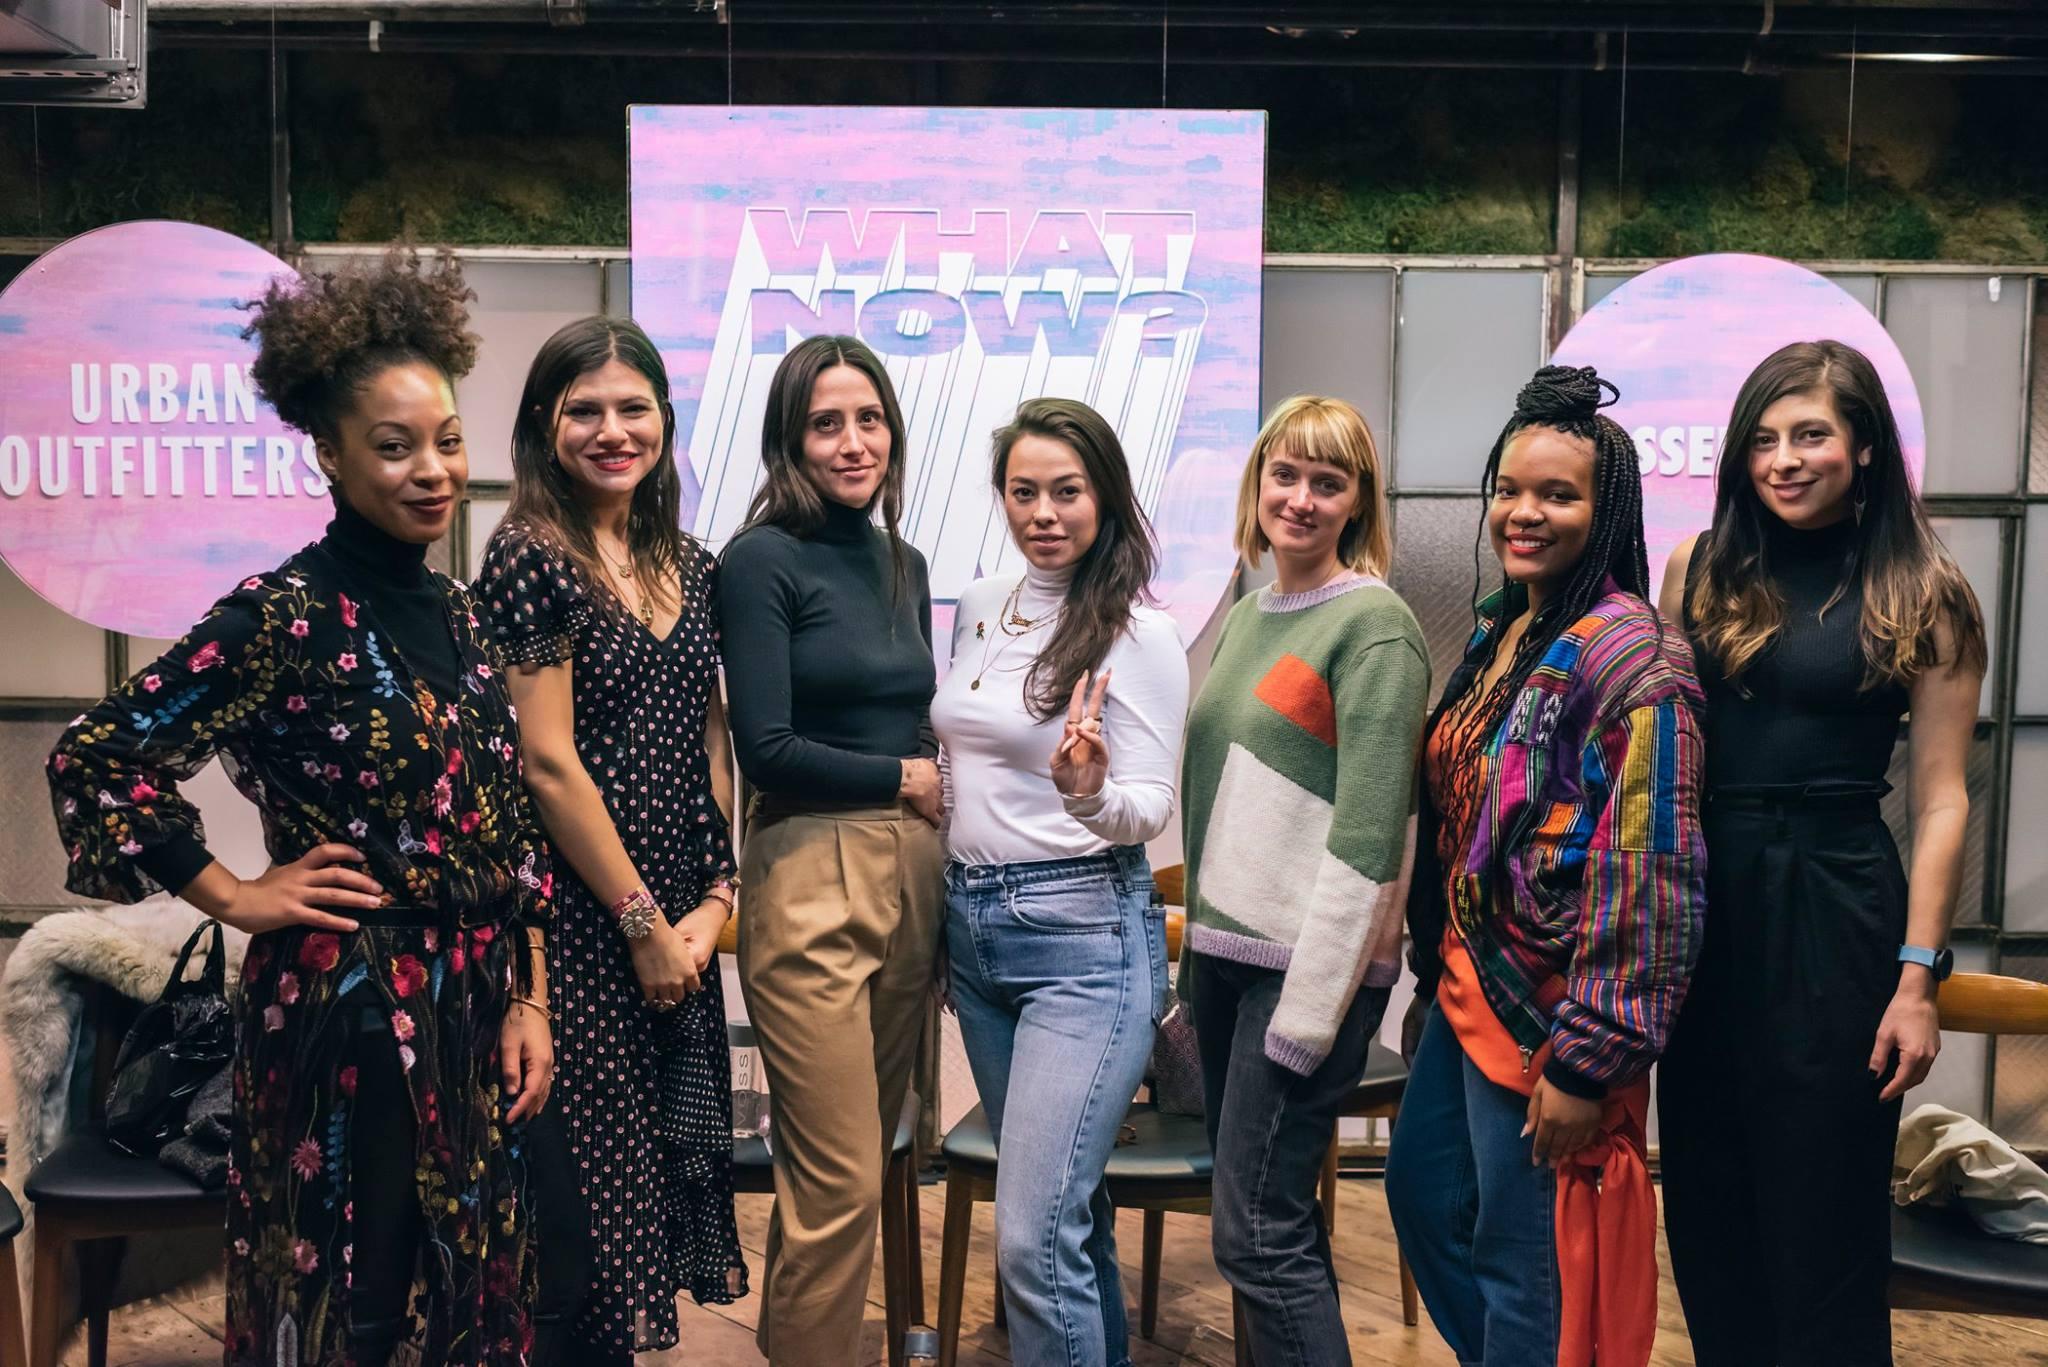 Panelists from left to right:    Christina Coleman   ,    Susan Alexandra   ,    Rachel Howe   ,    Janine Lee   ,    Ellen Van Dusen   , Shydeia Caldwell, and Moderator    Erin Allweiss   . Not pictured:    Grace Miceli   .